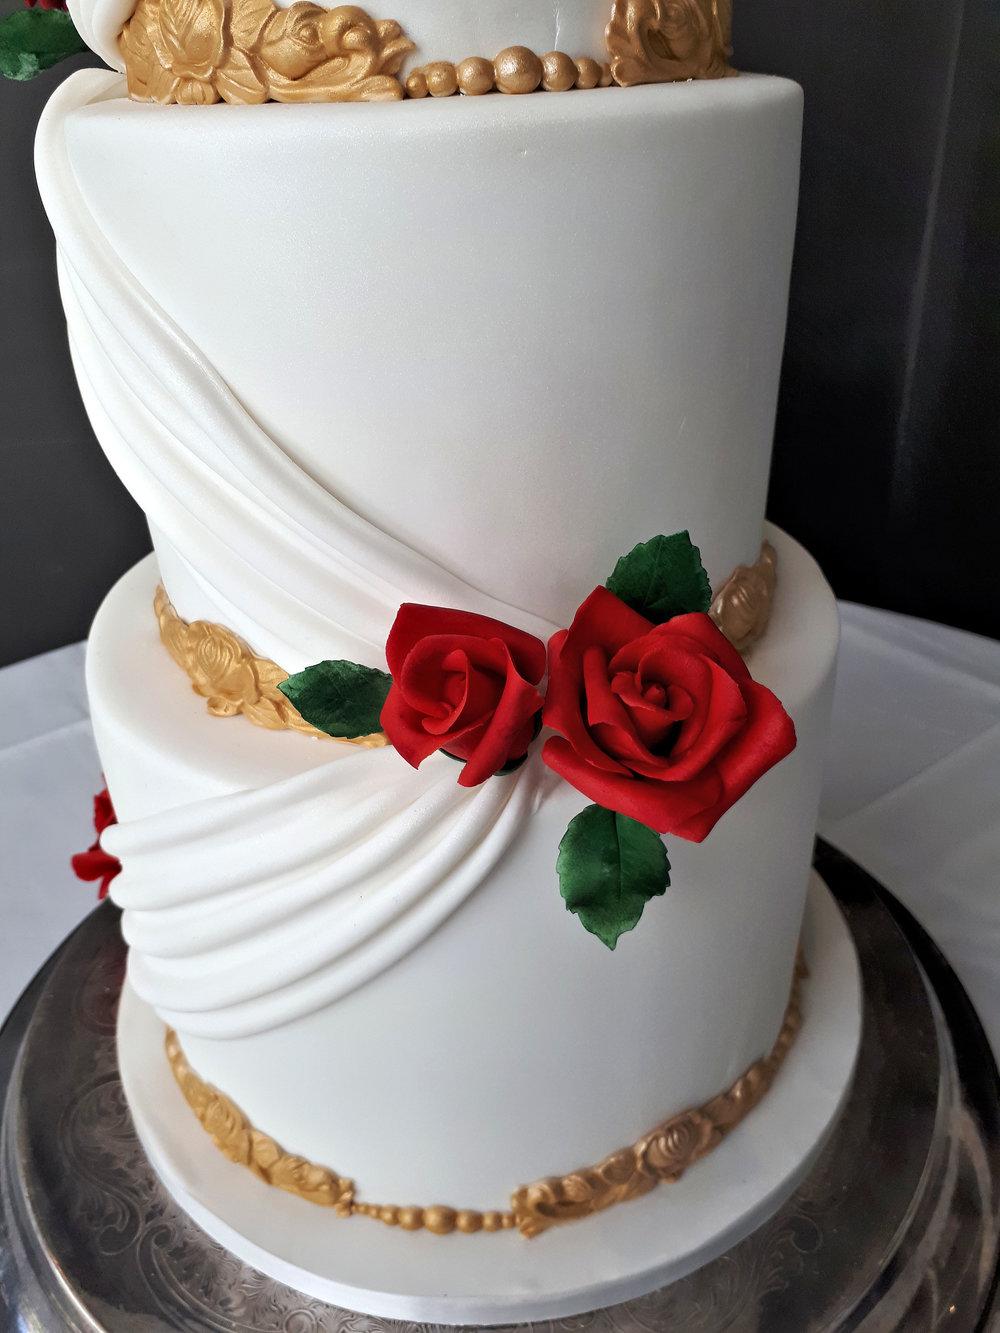 Grecian White & Gold Wedding Cake 3.jpg